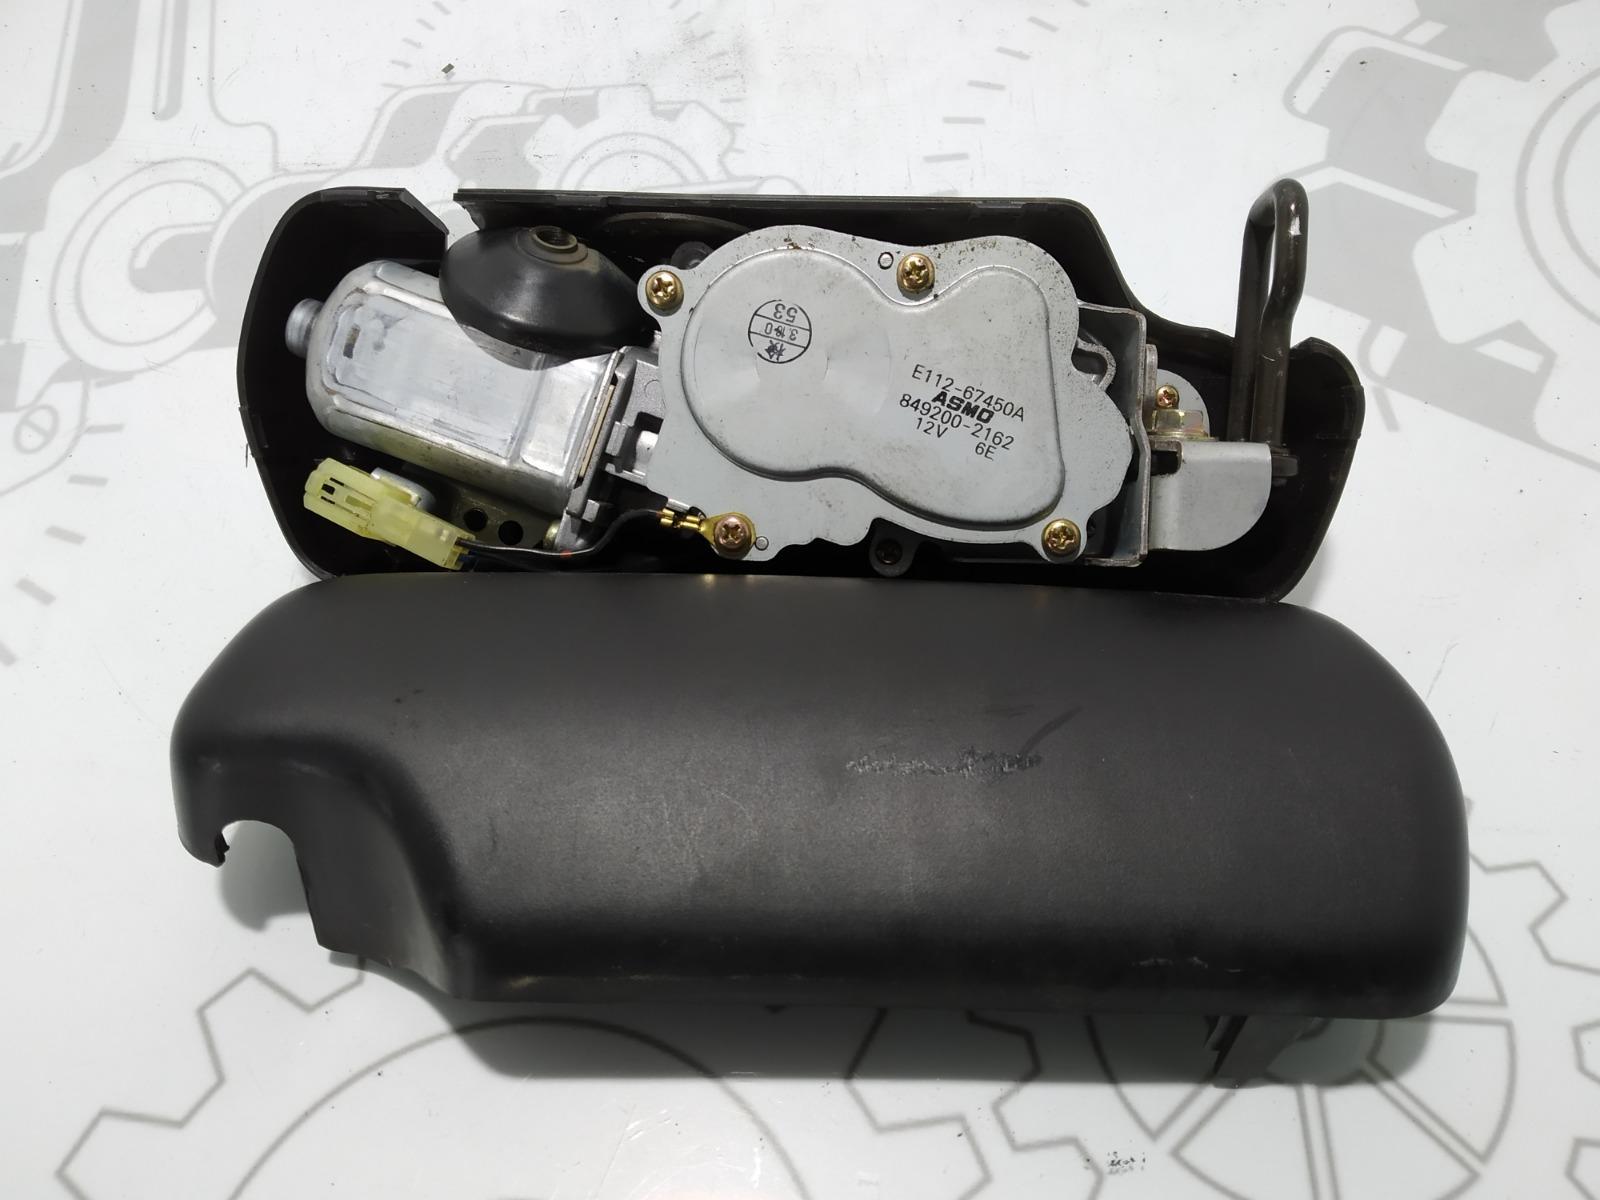 Моторчик заднего стеклоочистителя (дворника) Mazda Tribute 3.0 I 2004 (б/у)